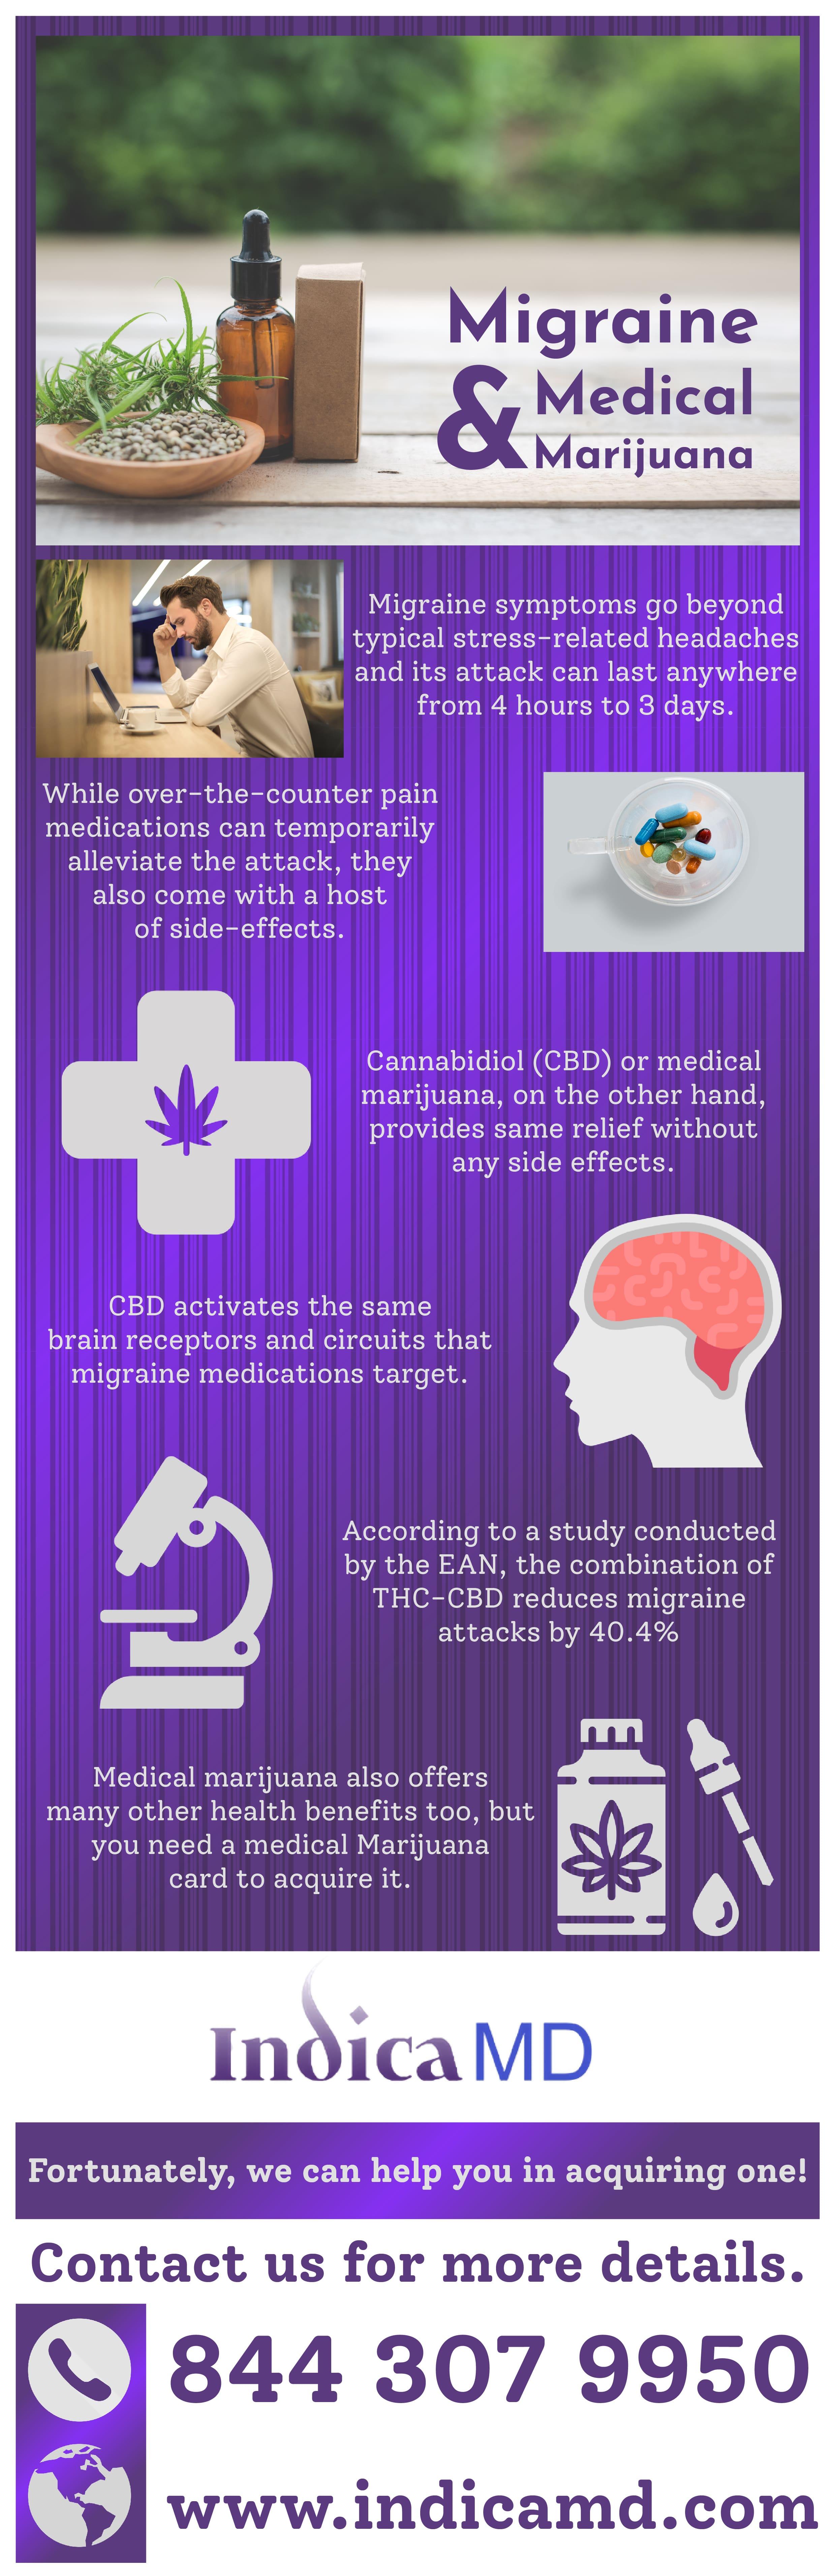 Migraine & Medical Marijuana